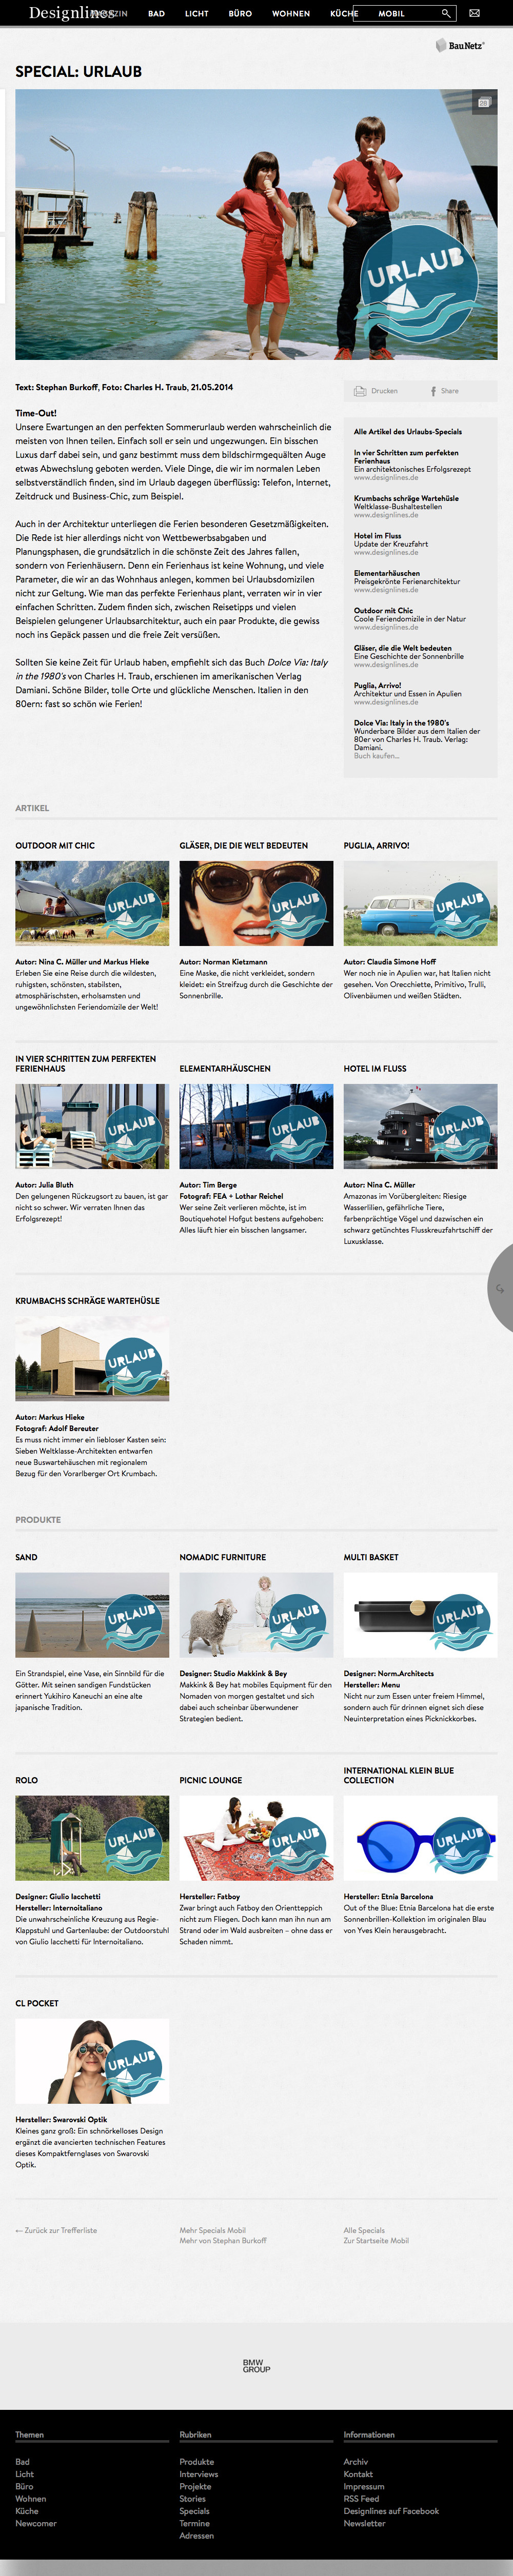 Dolce Via - Designline (Germany) - May 21 2014 .jpg